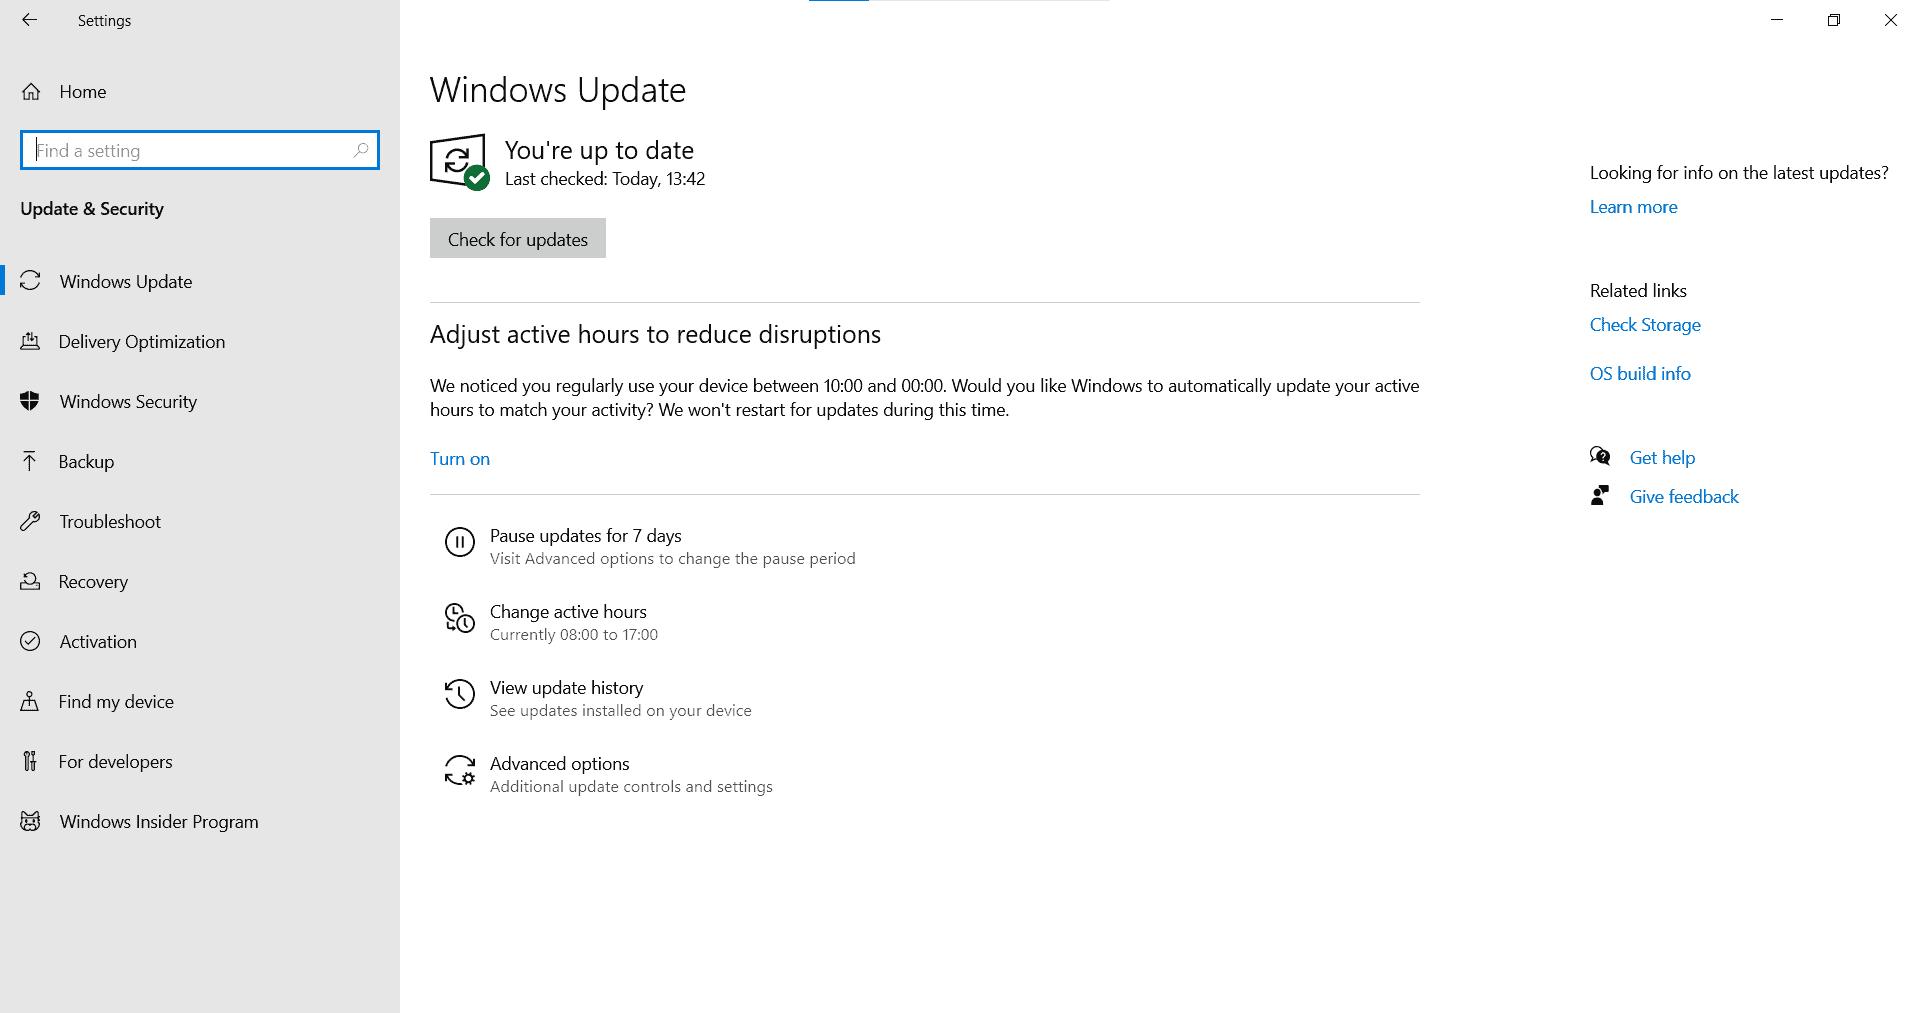 How to Upgrade Windows 10 to Windows 11?